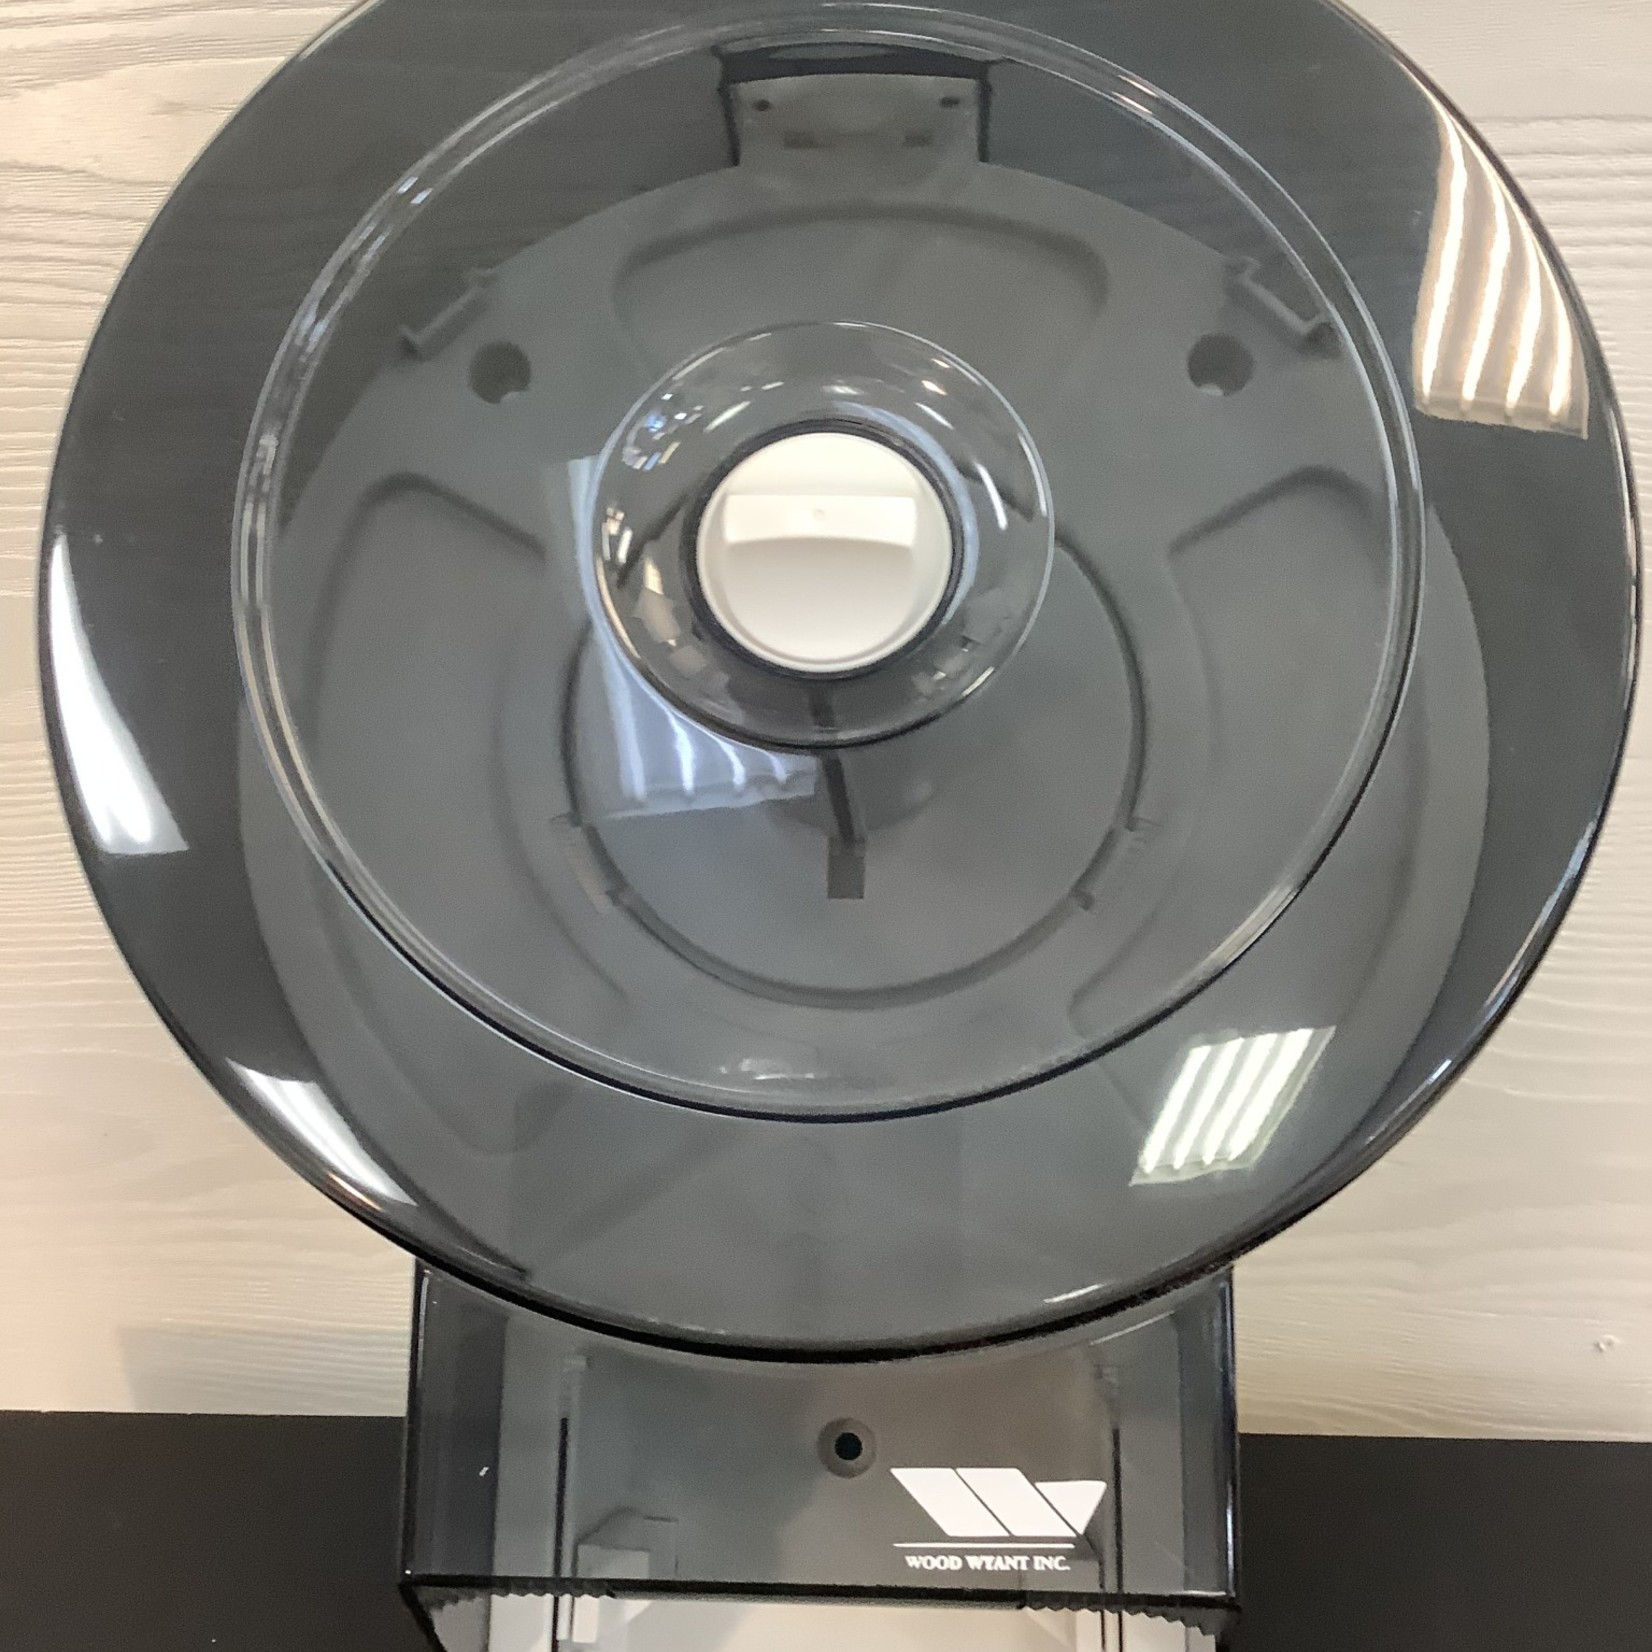 Commercial Circular Bathroom Tissue Dispenser